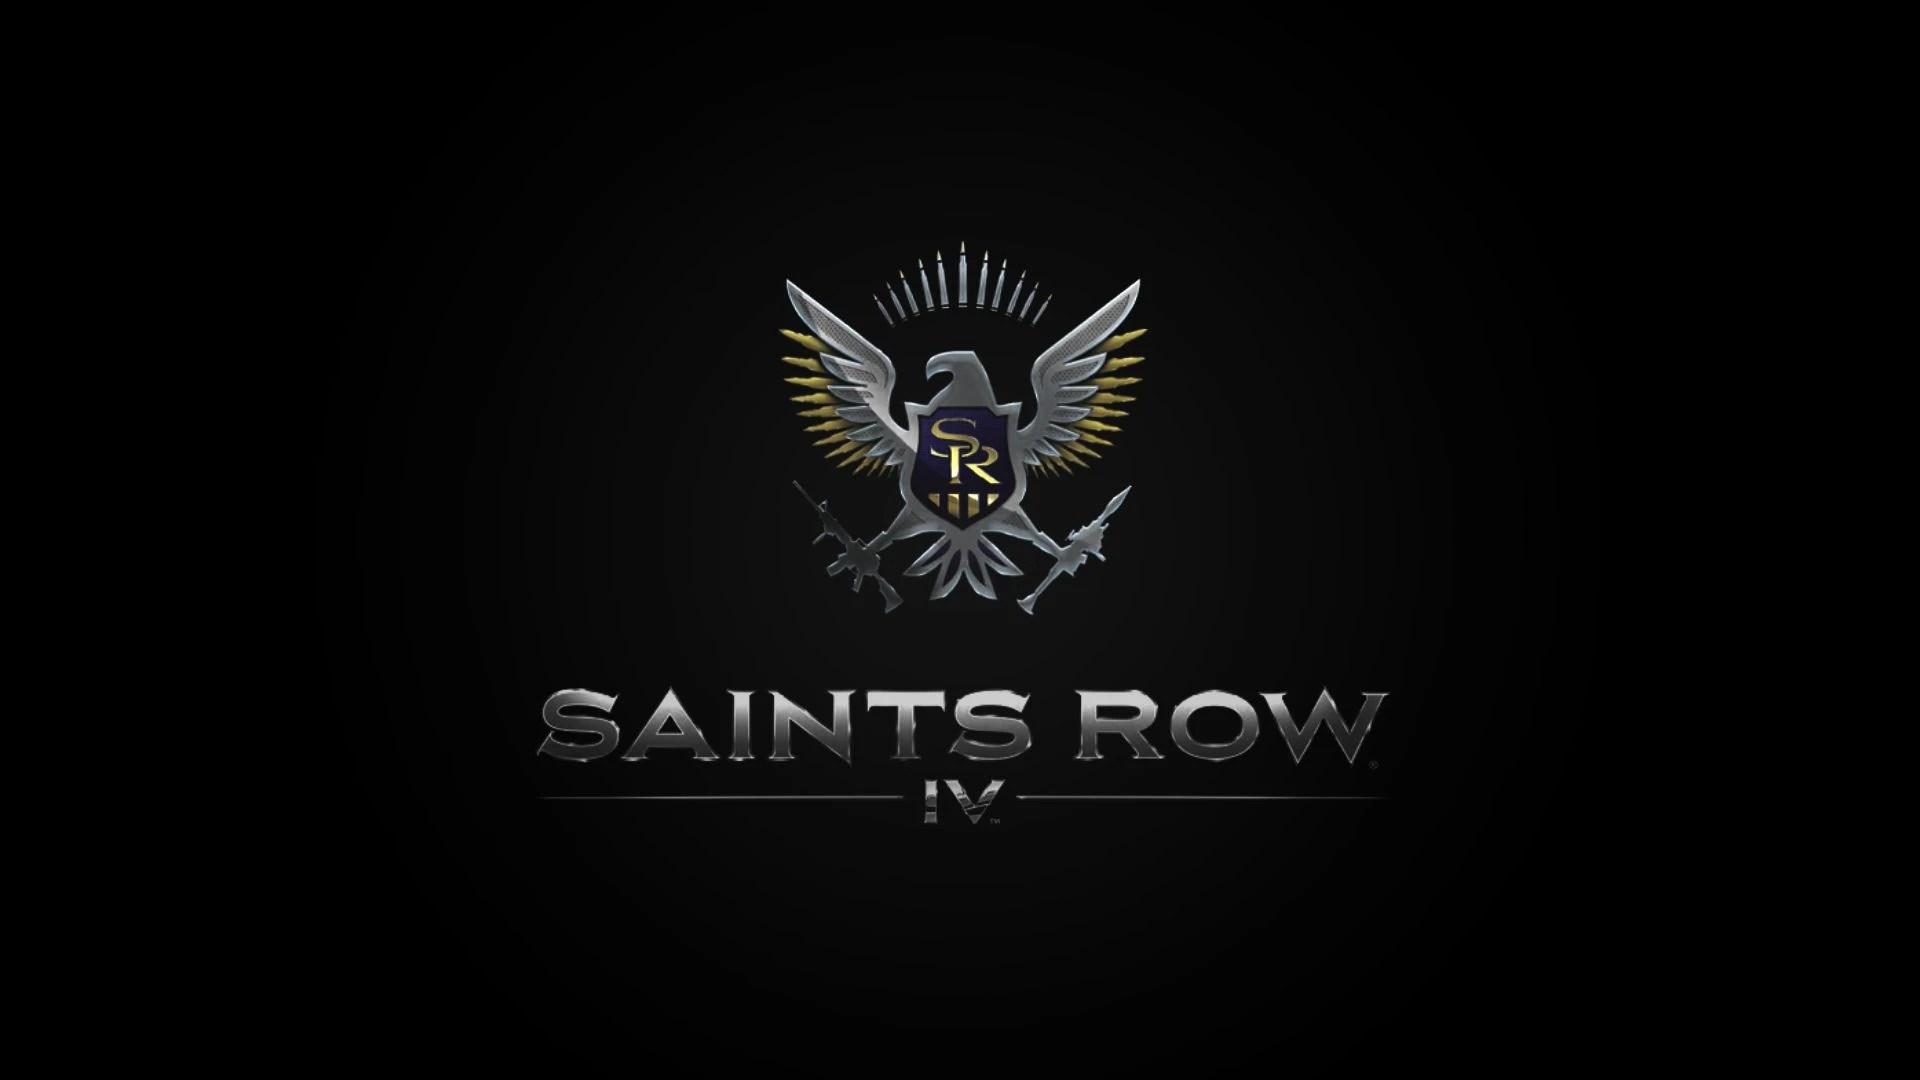 Nude Mod No Bullshit At Saints Row 4 Nexus